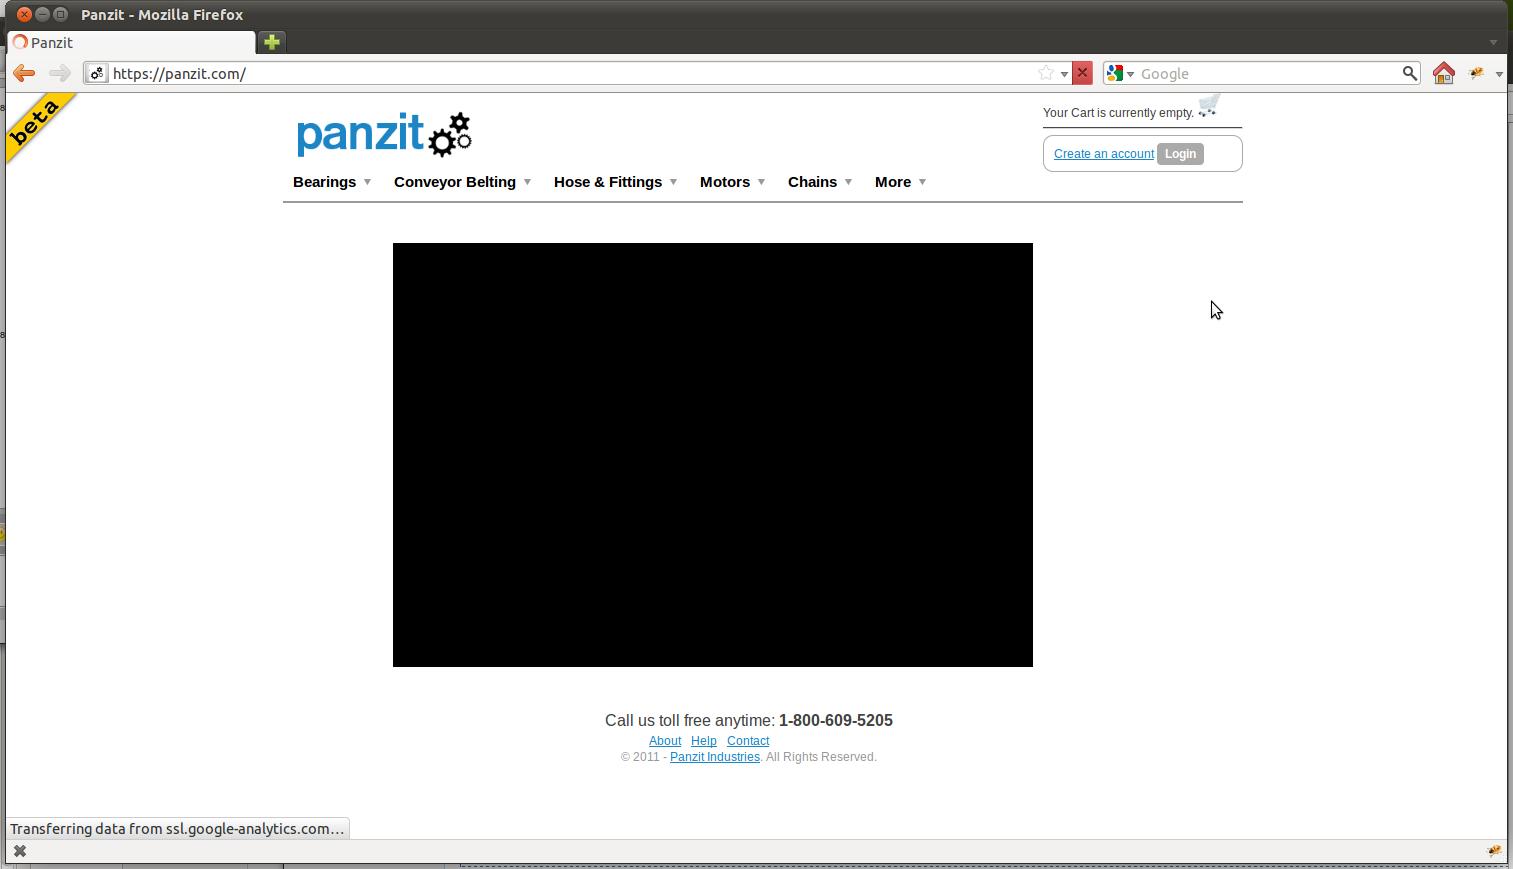 Panzit.com